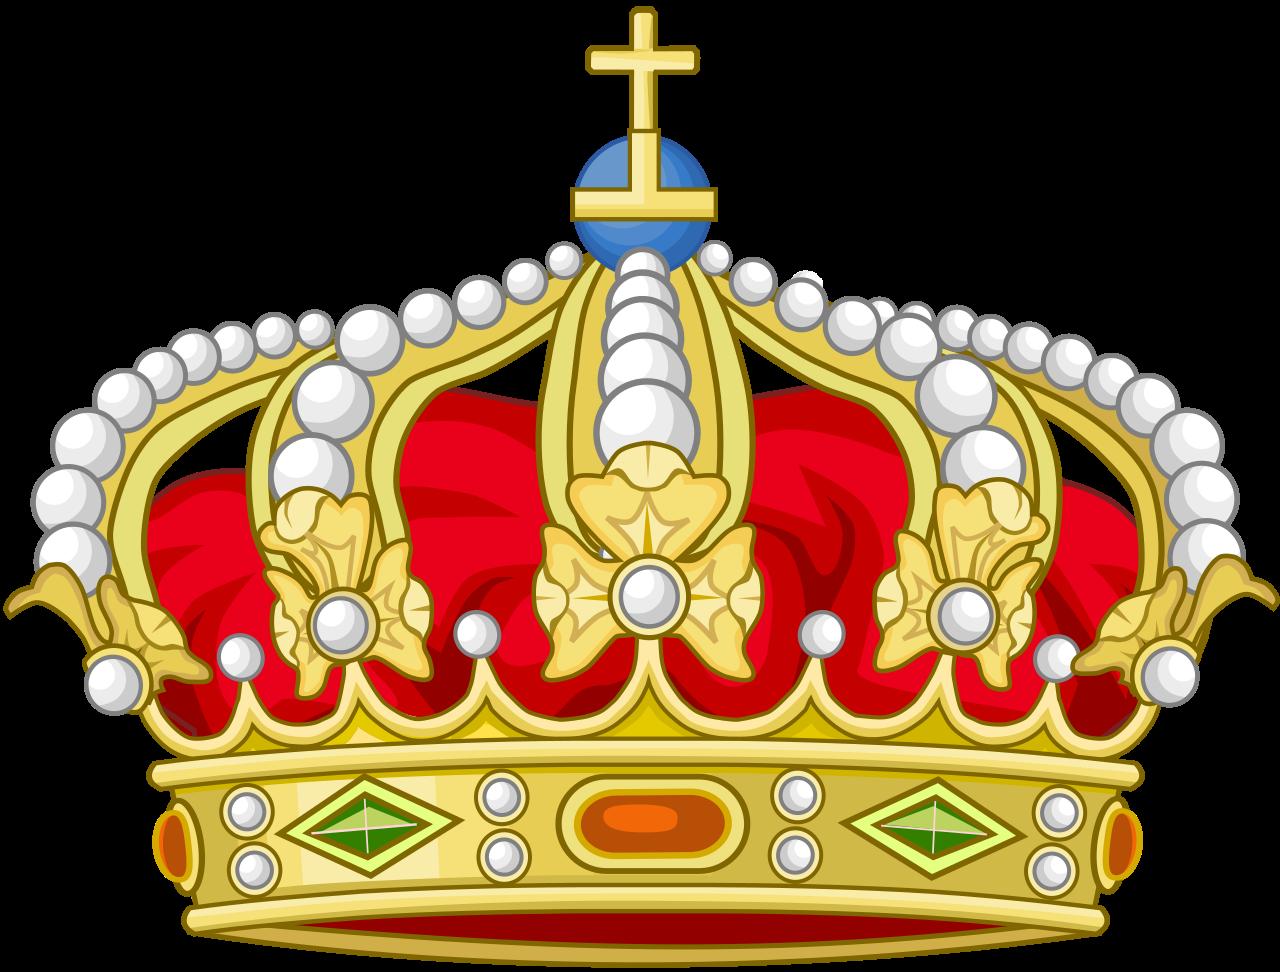 Crown Transparent Background